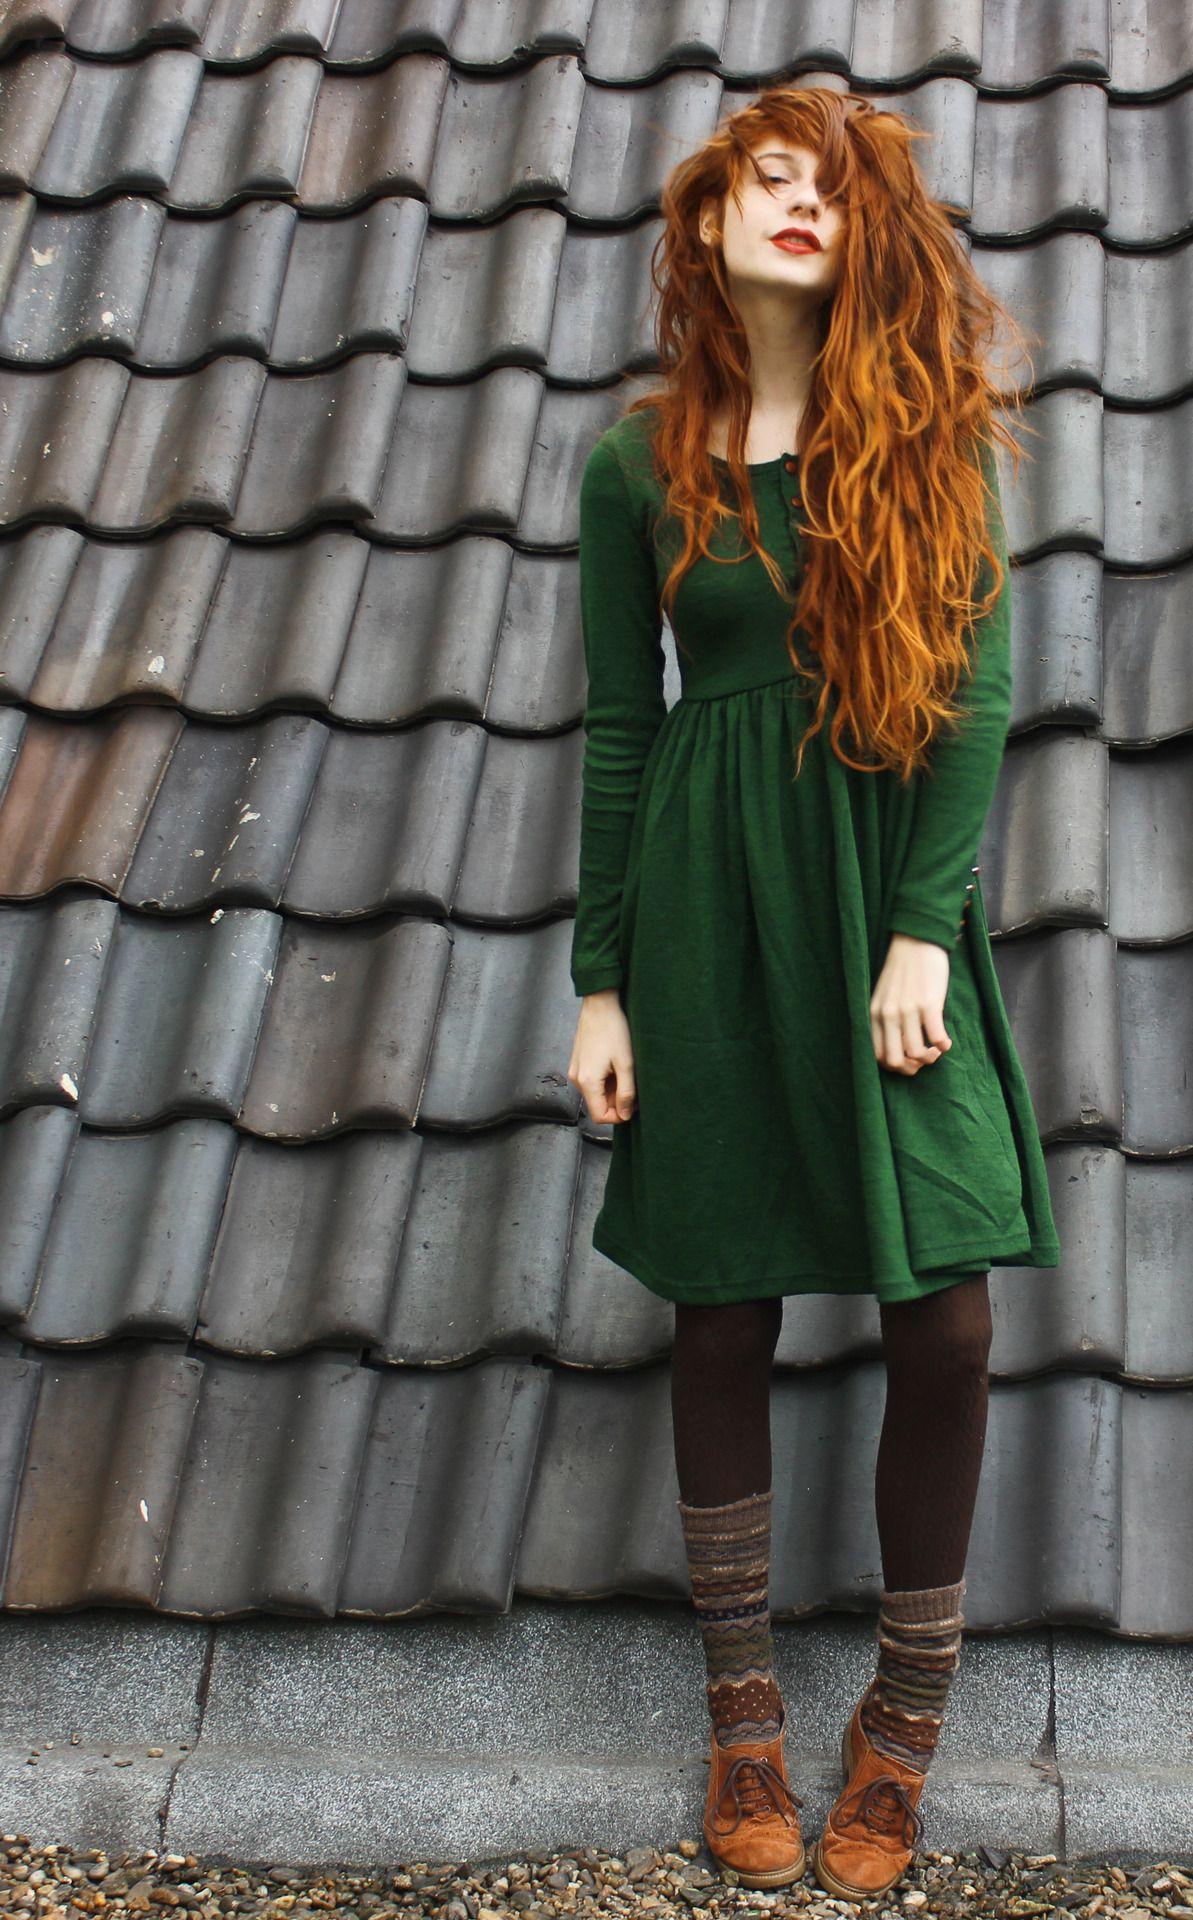 Rygee_melirovanie (22)